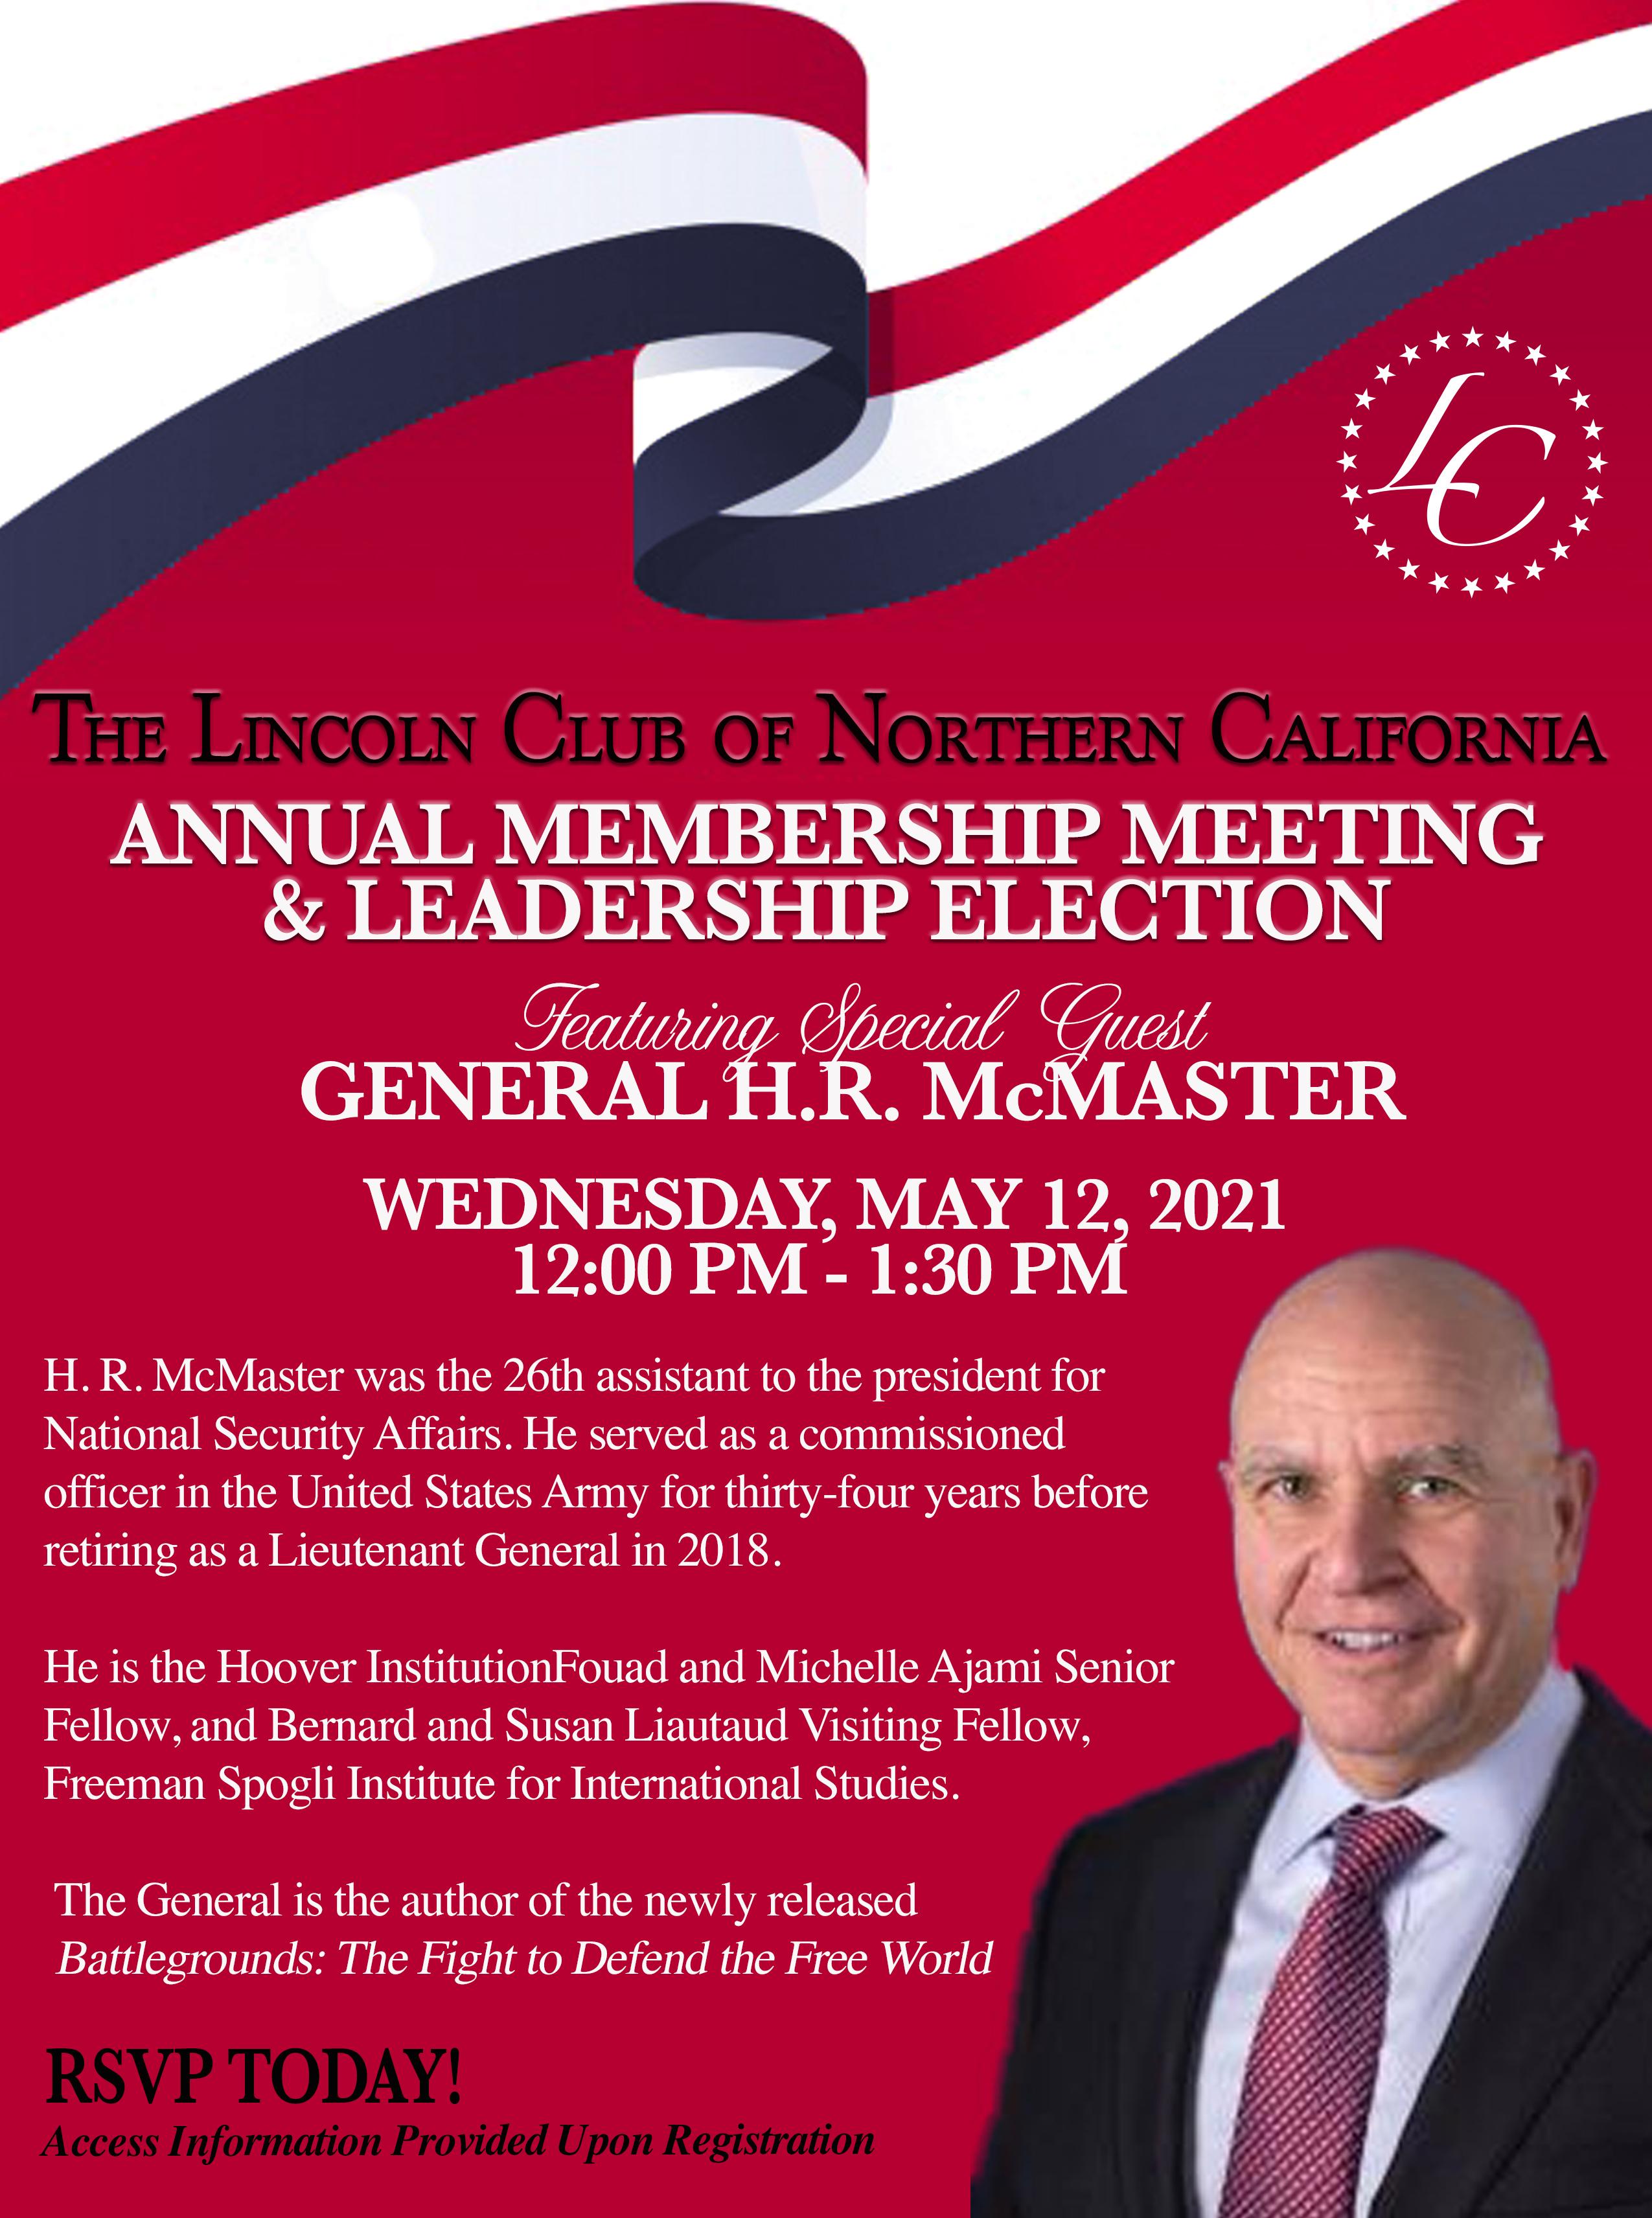 Annual Membership Meeting Invite